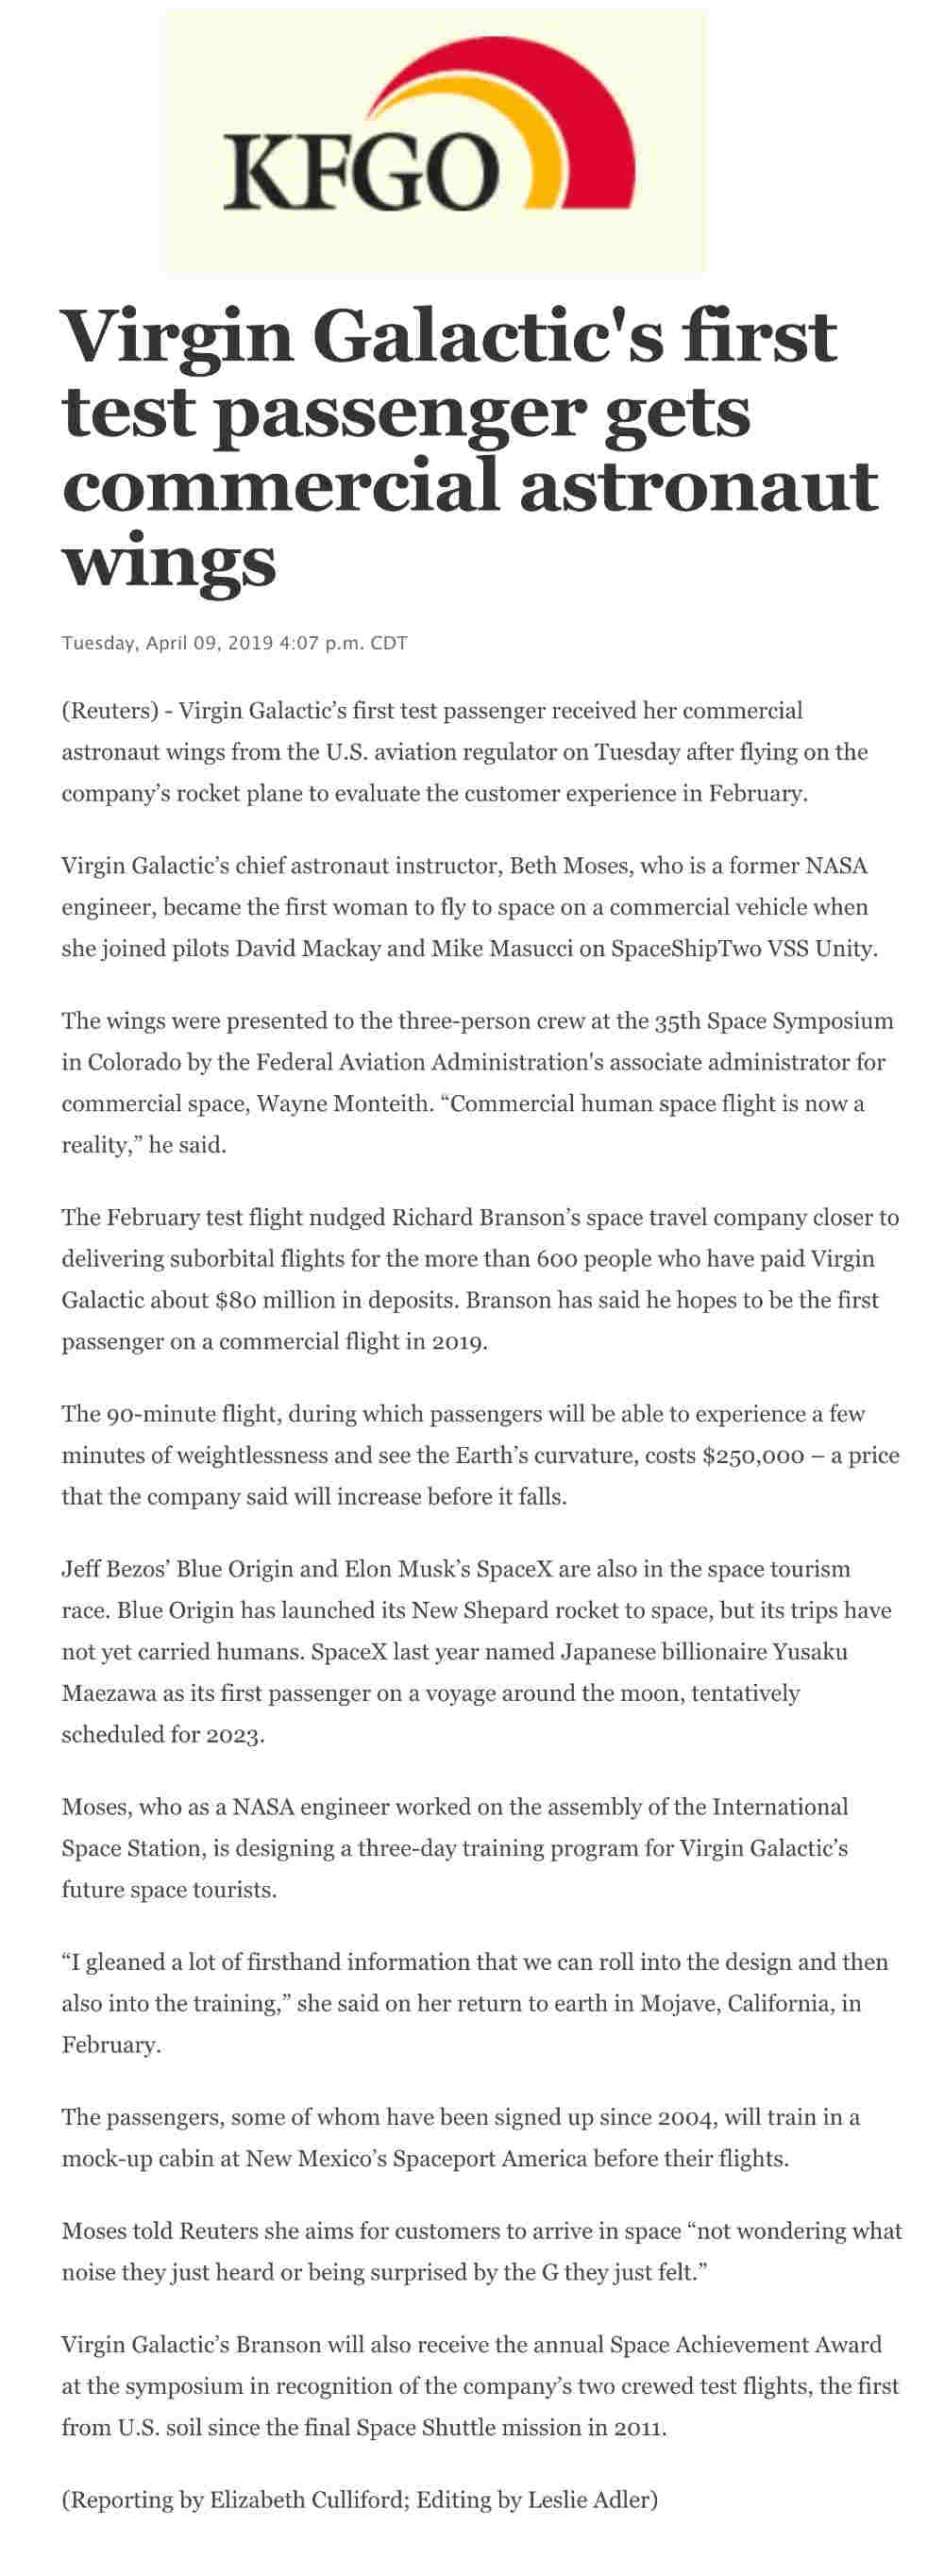 Beth Moses of Virgin Galactic gets astronaut wings